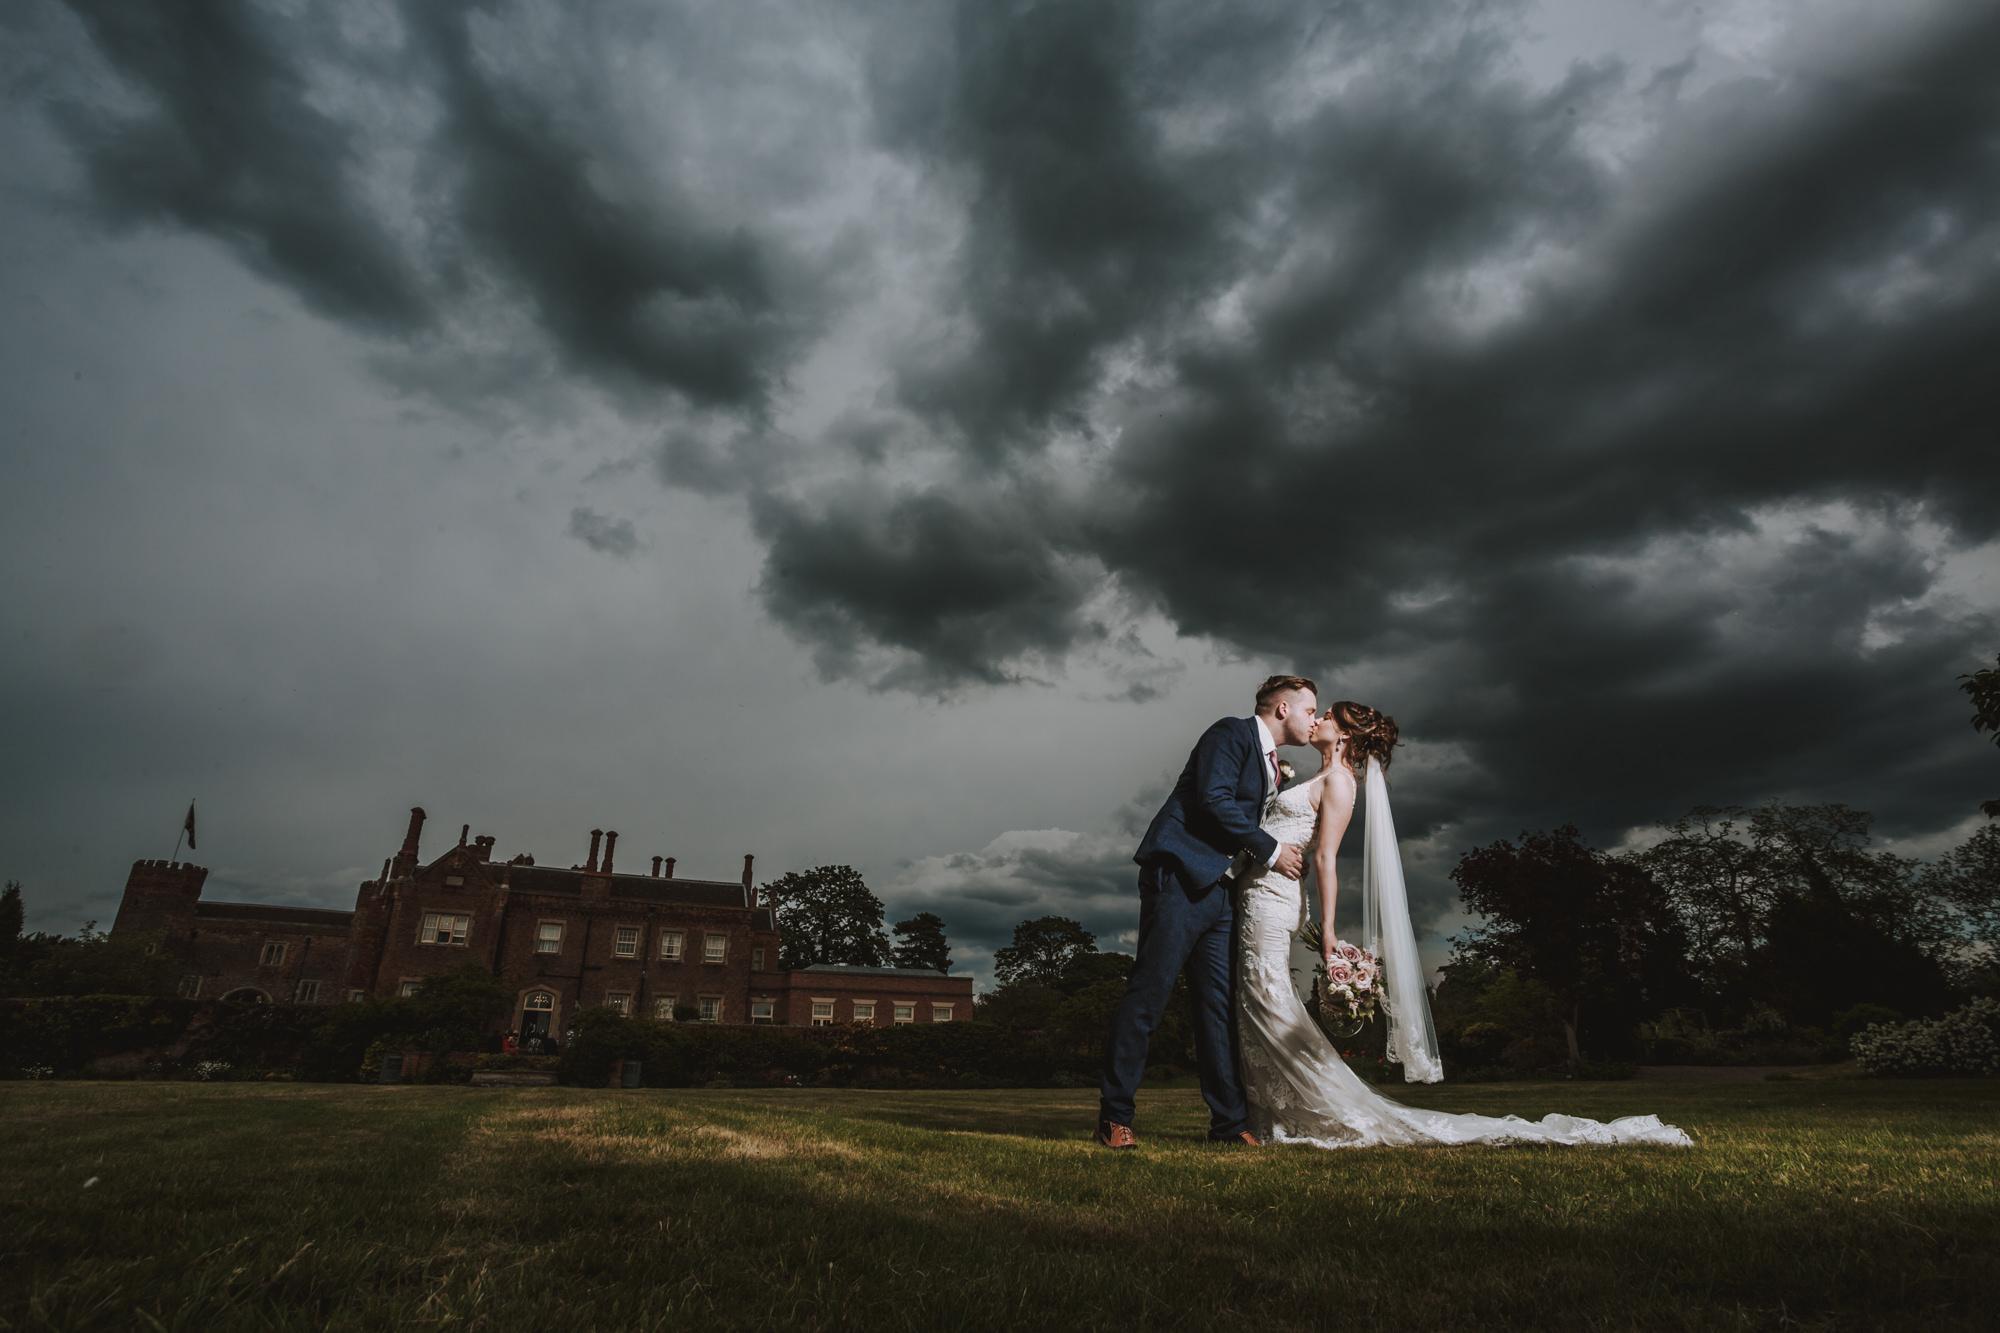 hodsock priory wedding photographers blog62.jpg